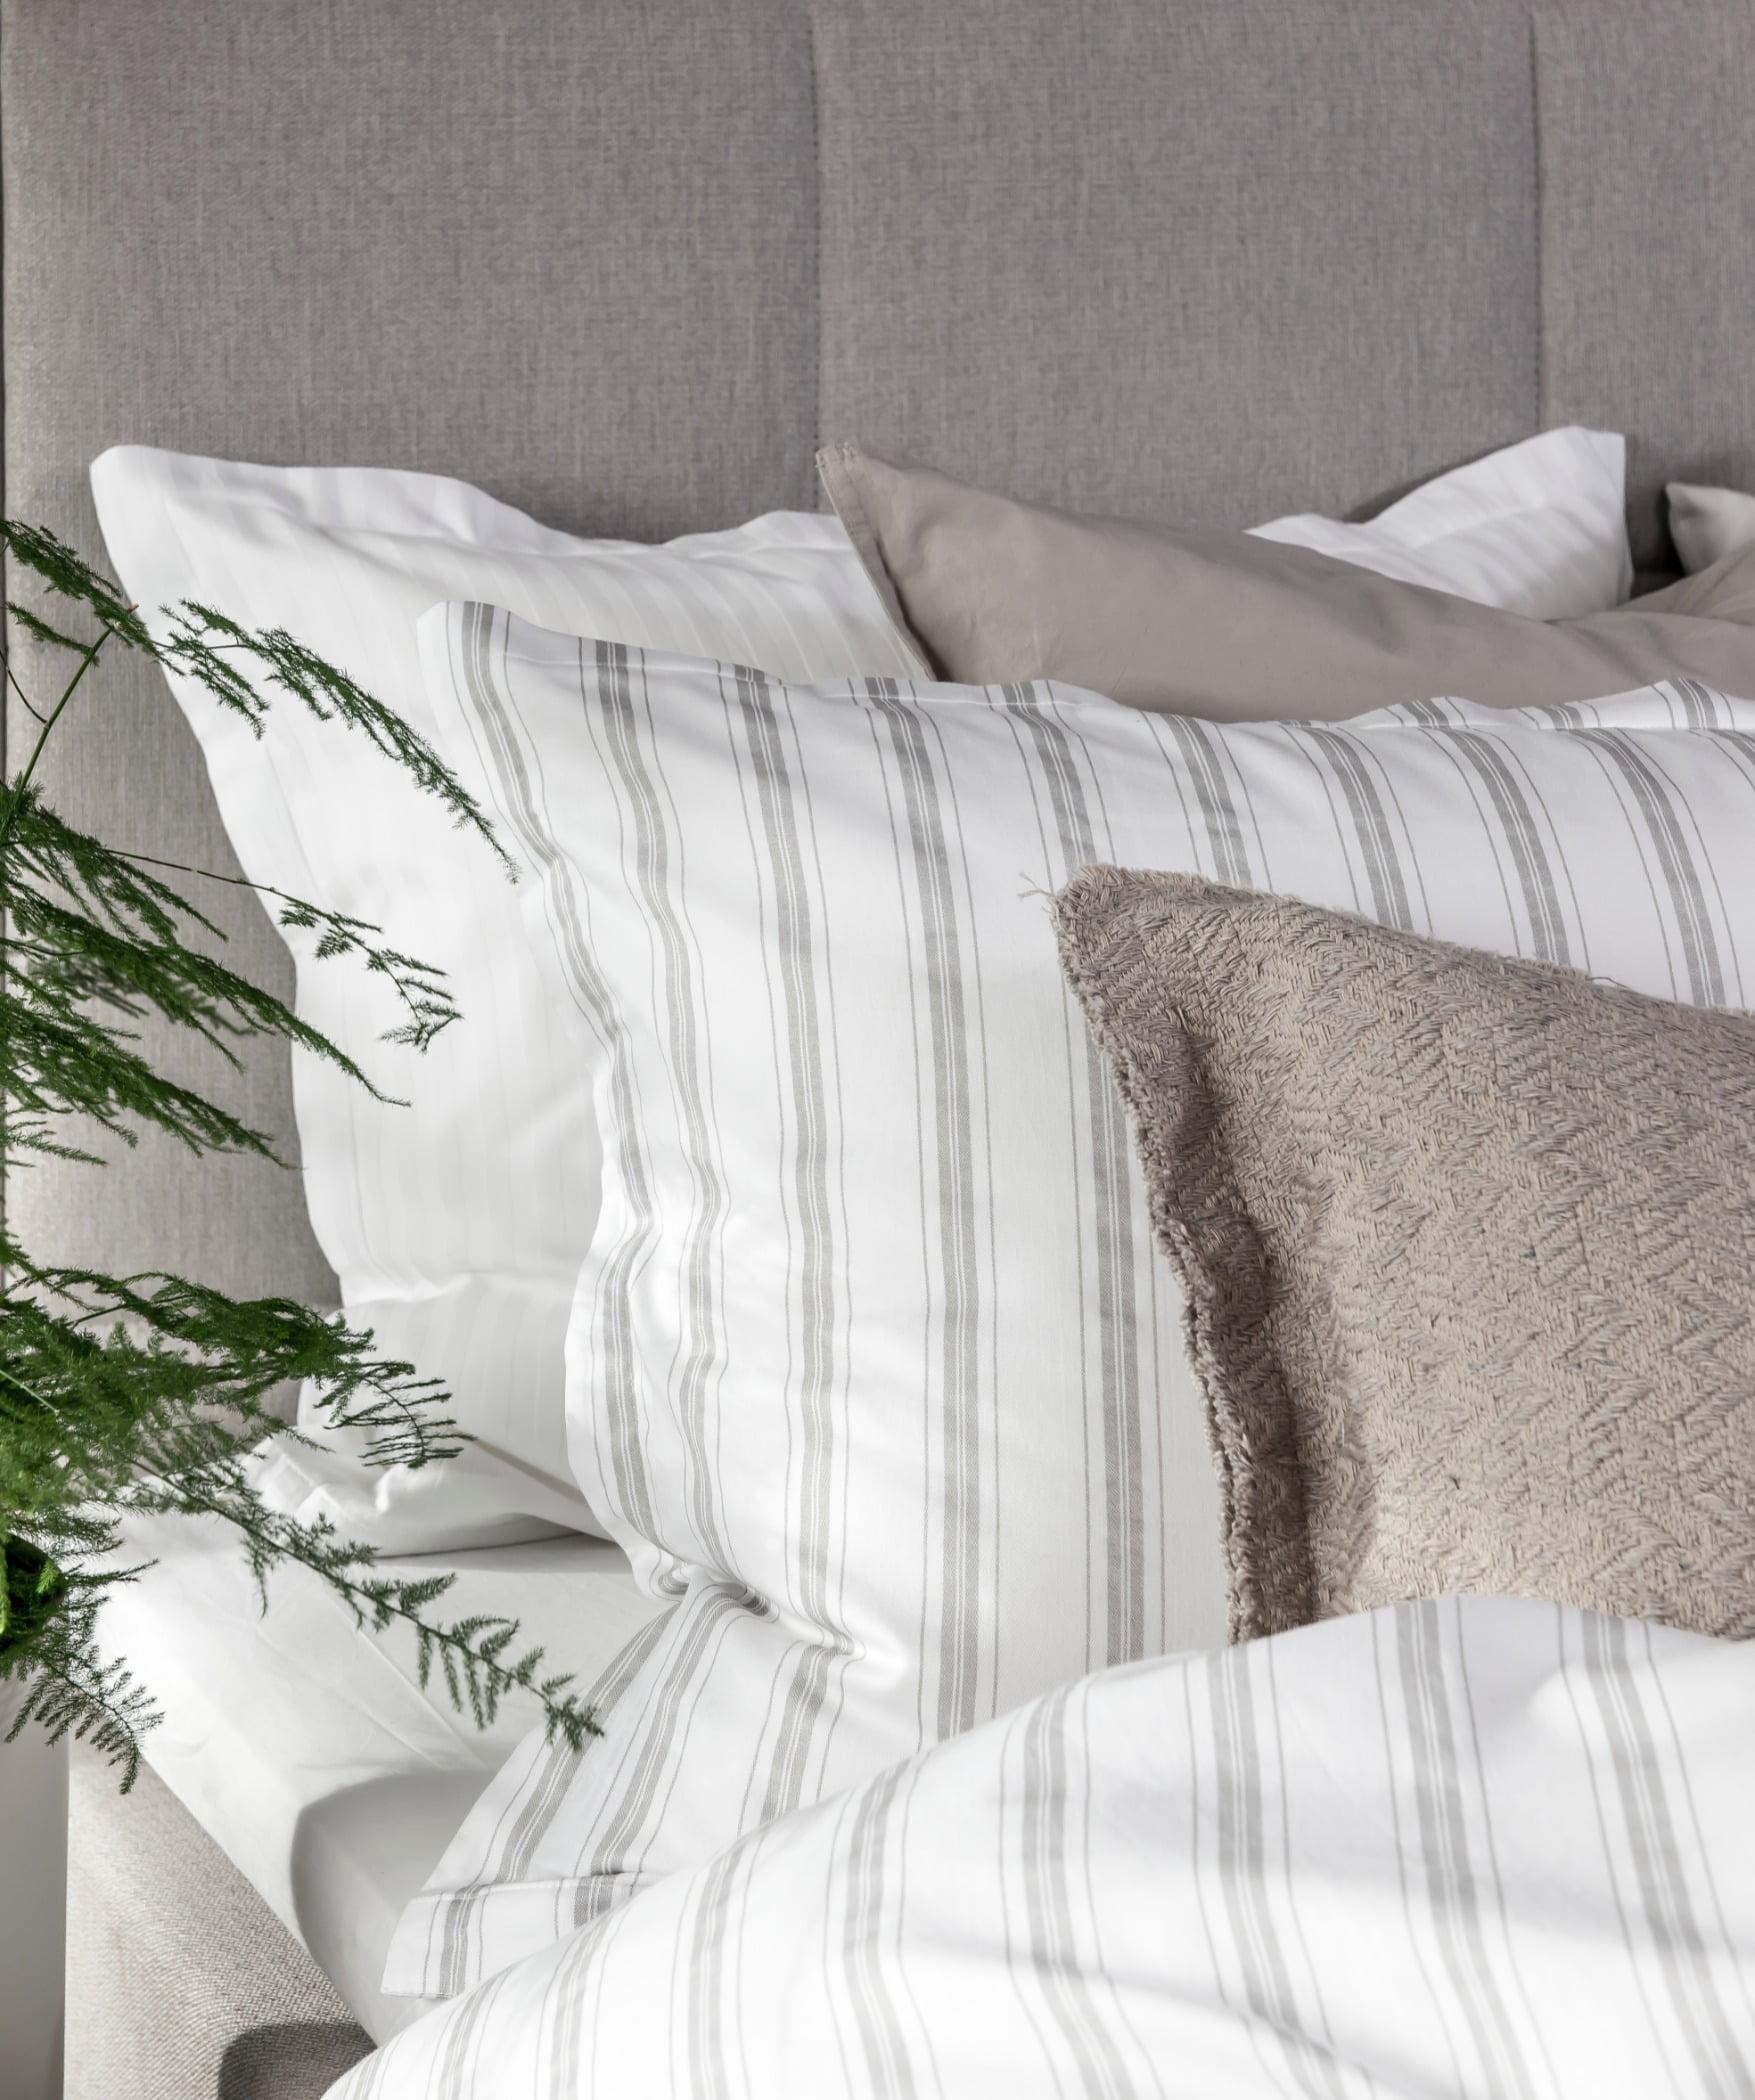 Interior design, studio couch, Living room, Furniture, White, Comfort, Textile, Pillow, Grey